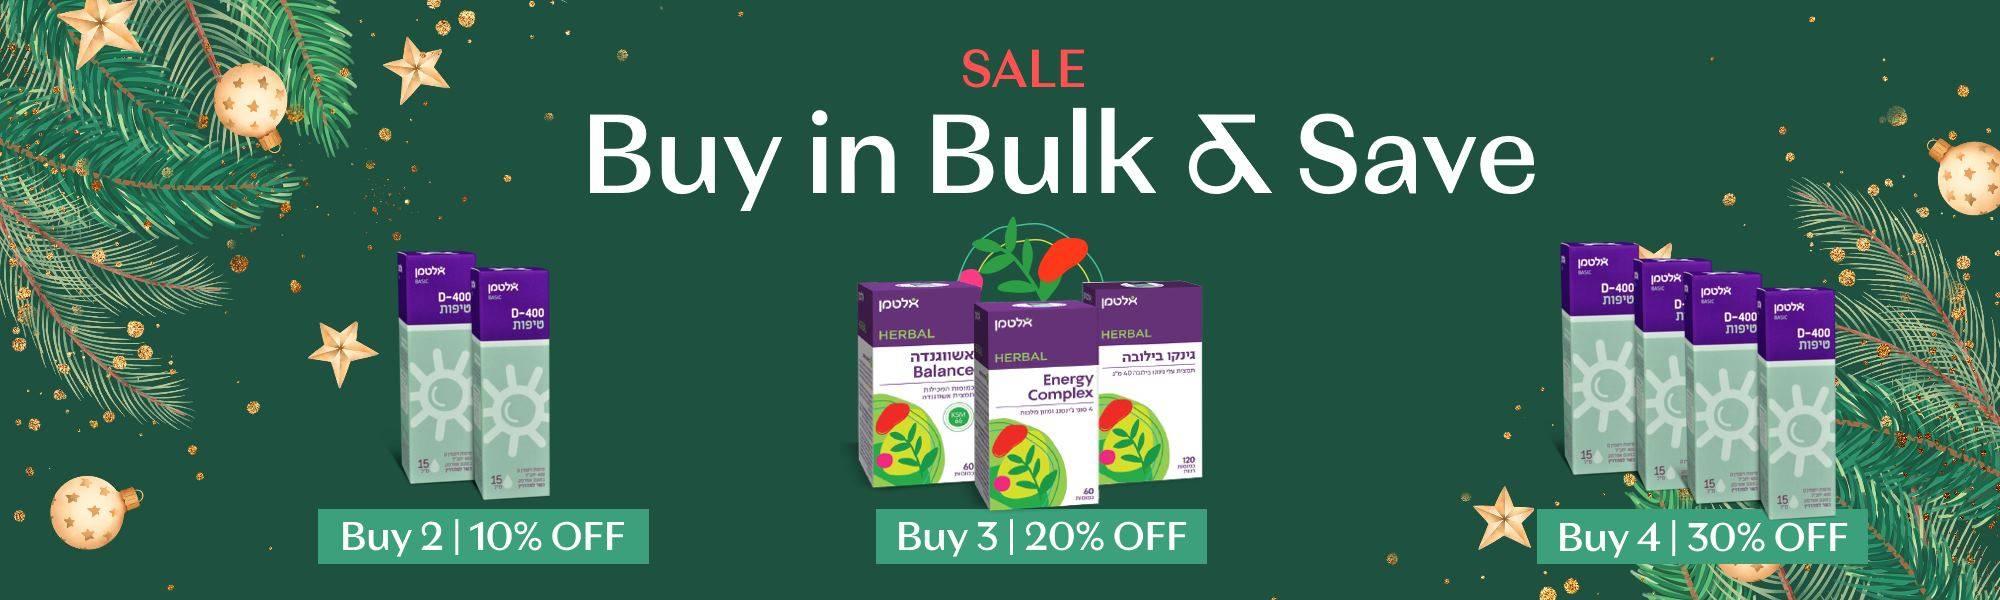 buy bulk and save on vitamins